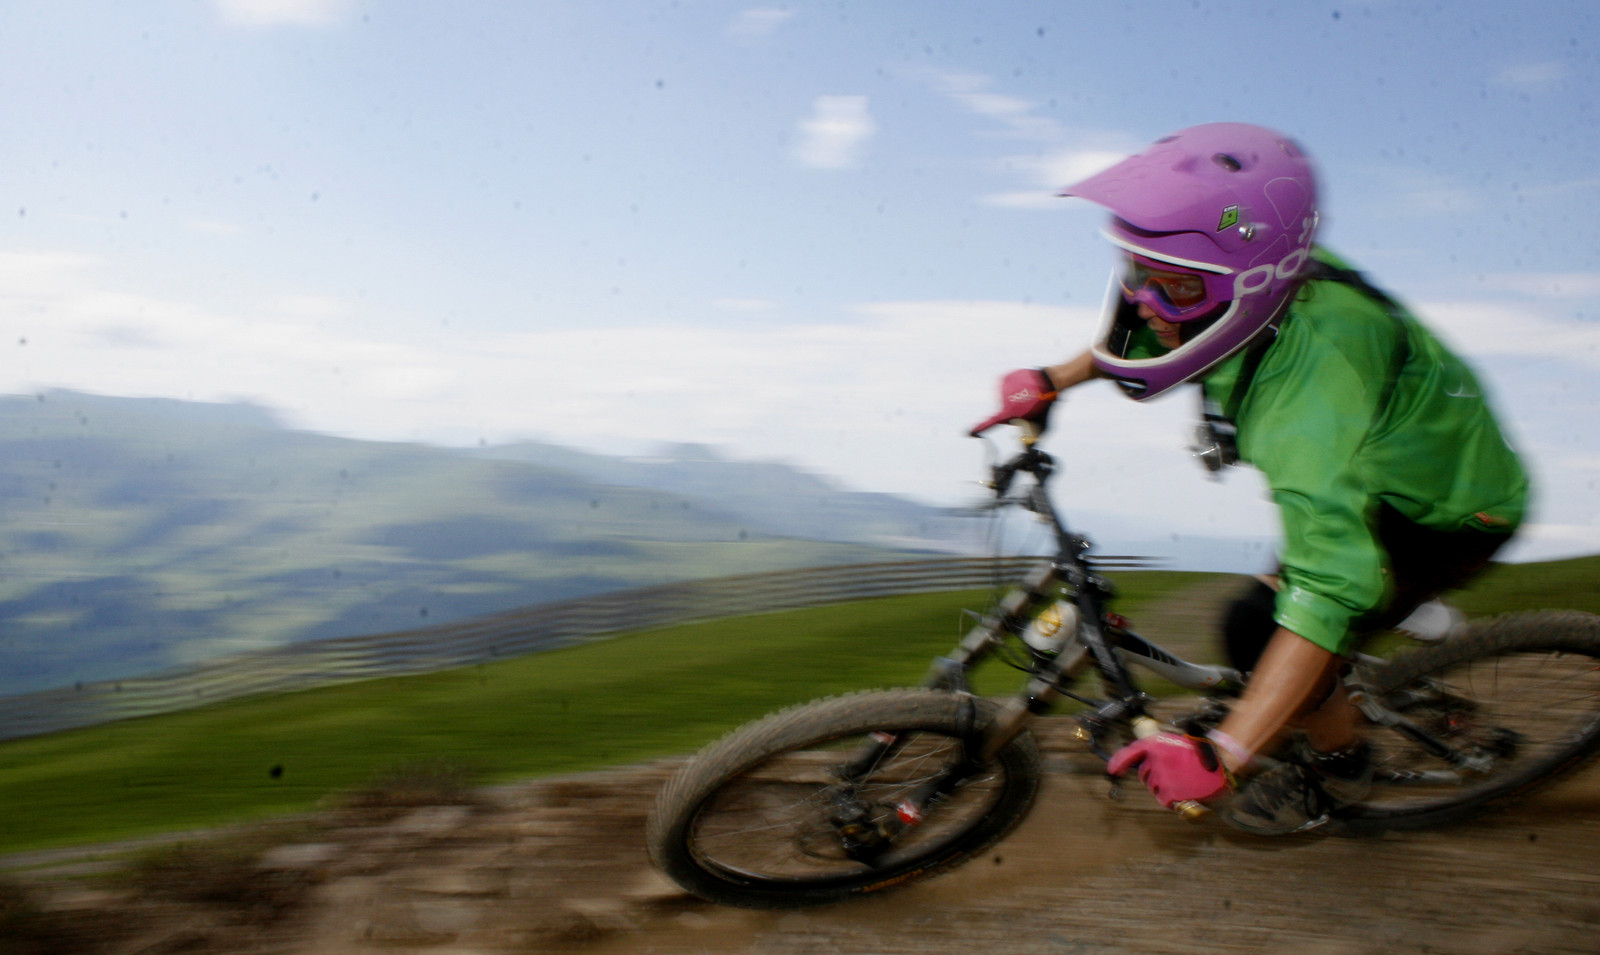 MG 9823 - The Gap - Mountain Biking Pictures - Vital MTB